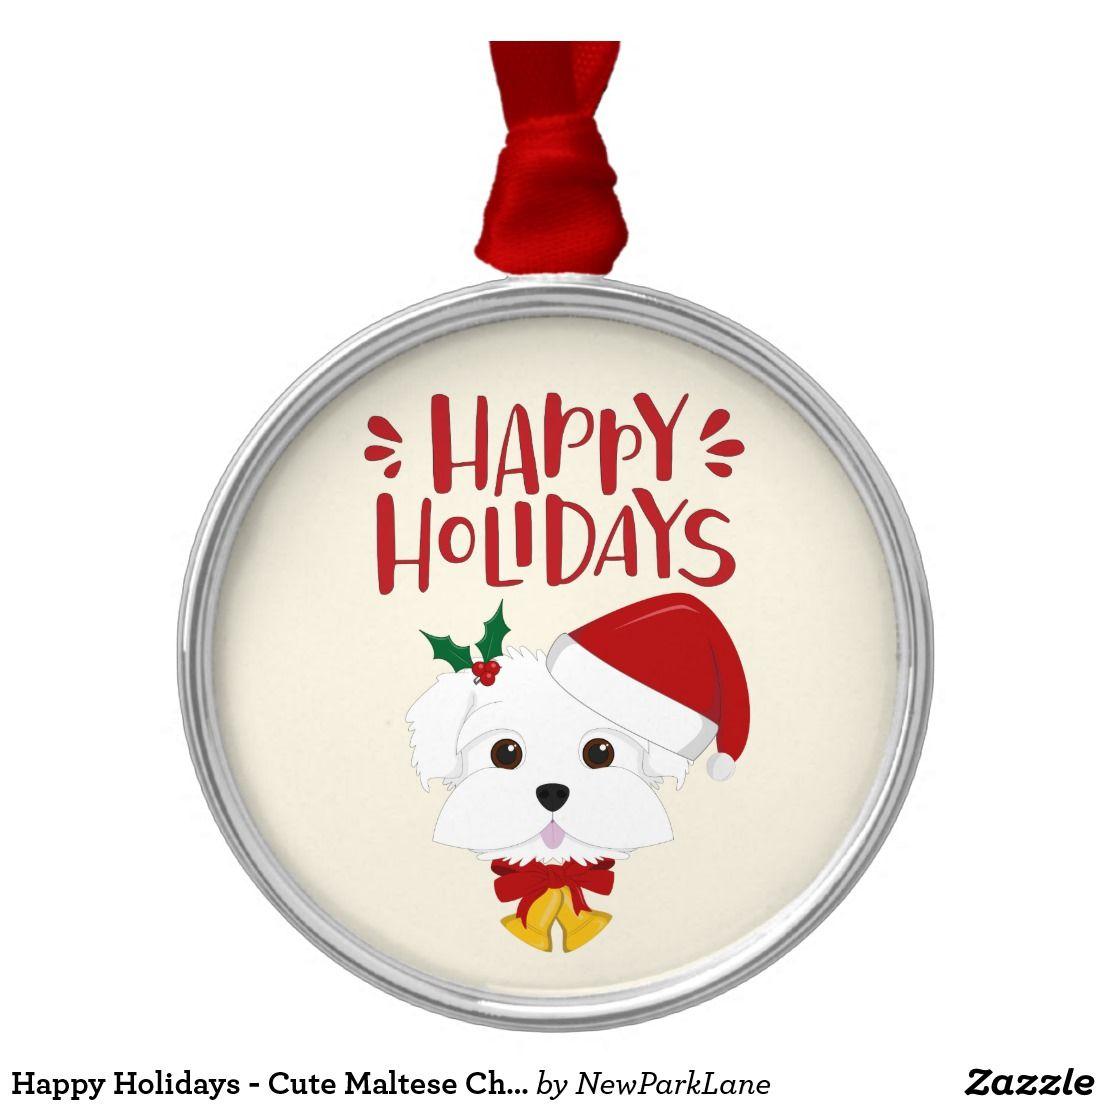 Happy Holidays Cute Maltese Christmas Ceramic Ornament Zazzle Com Happy Holidays Wishes Happy Holidays Ceramic Ornaments